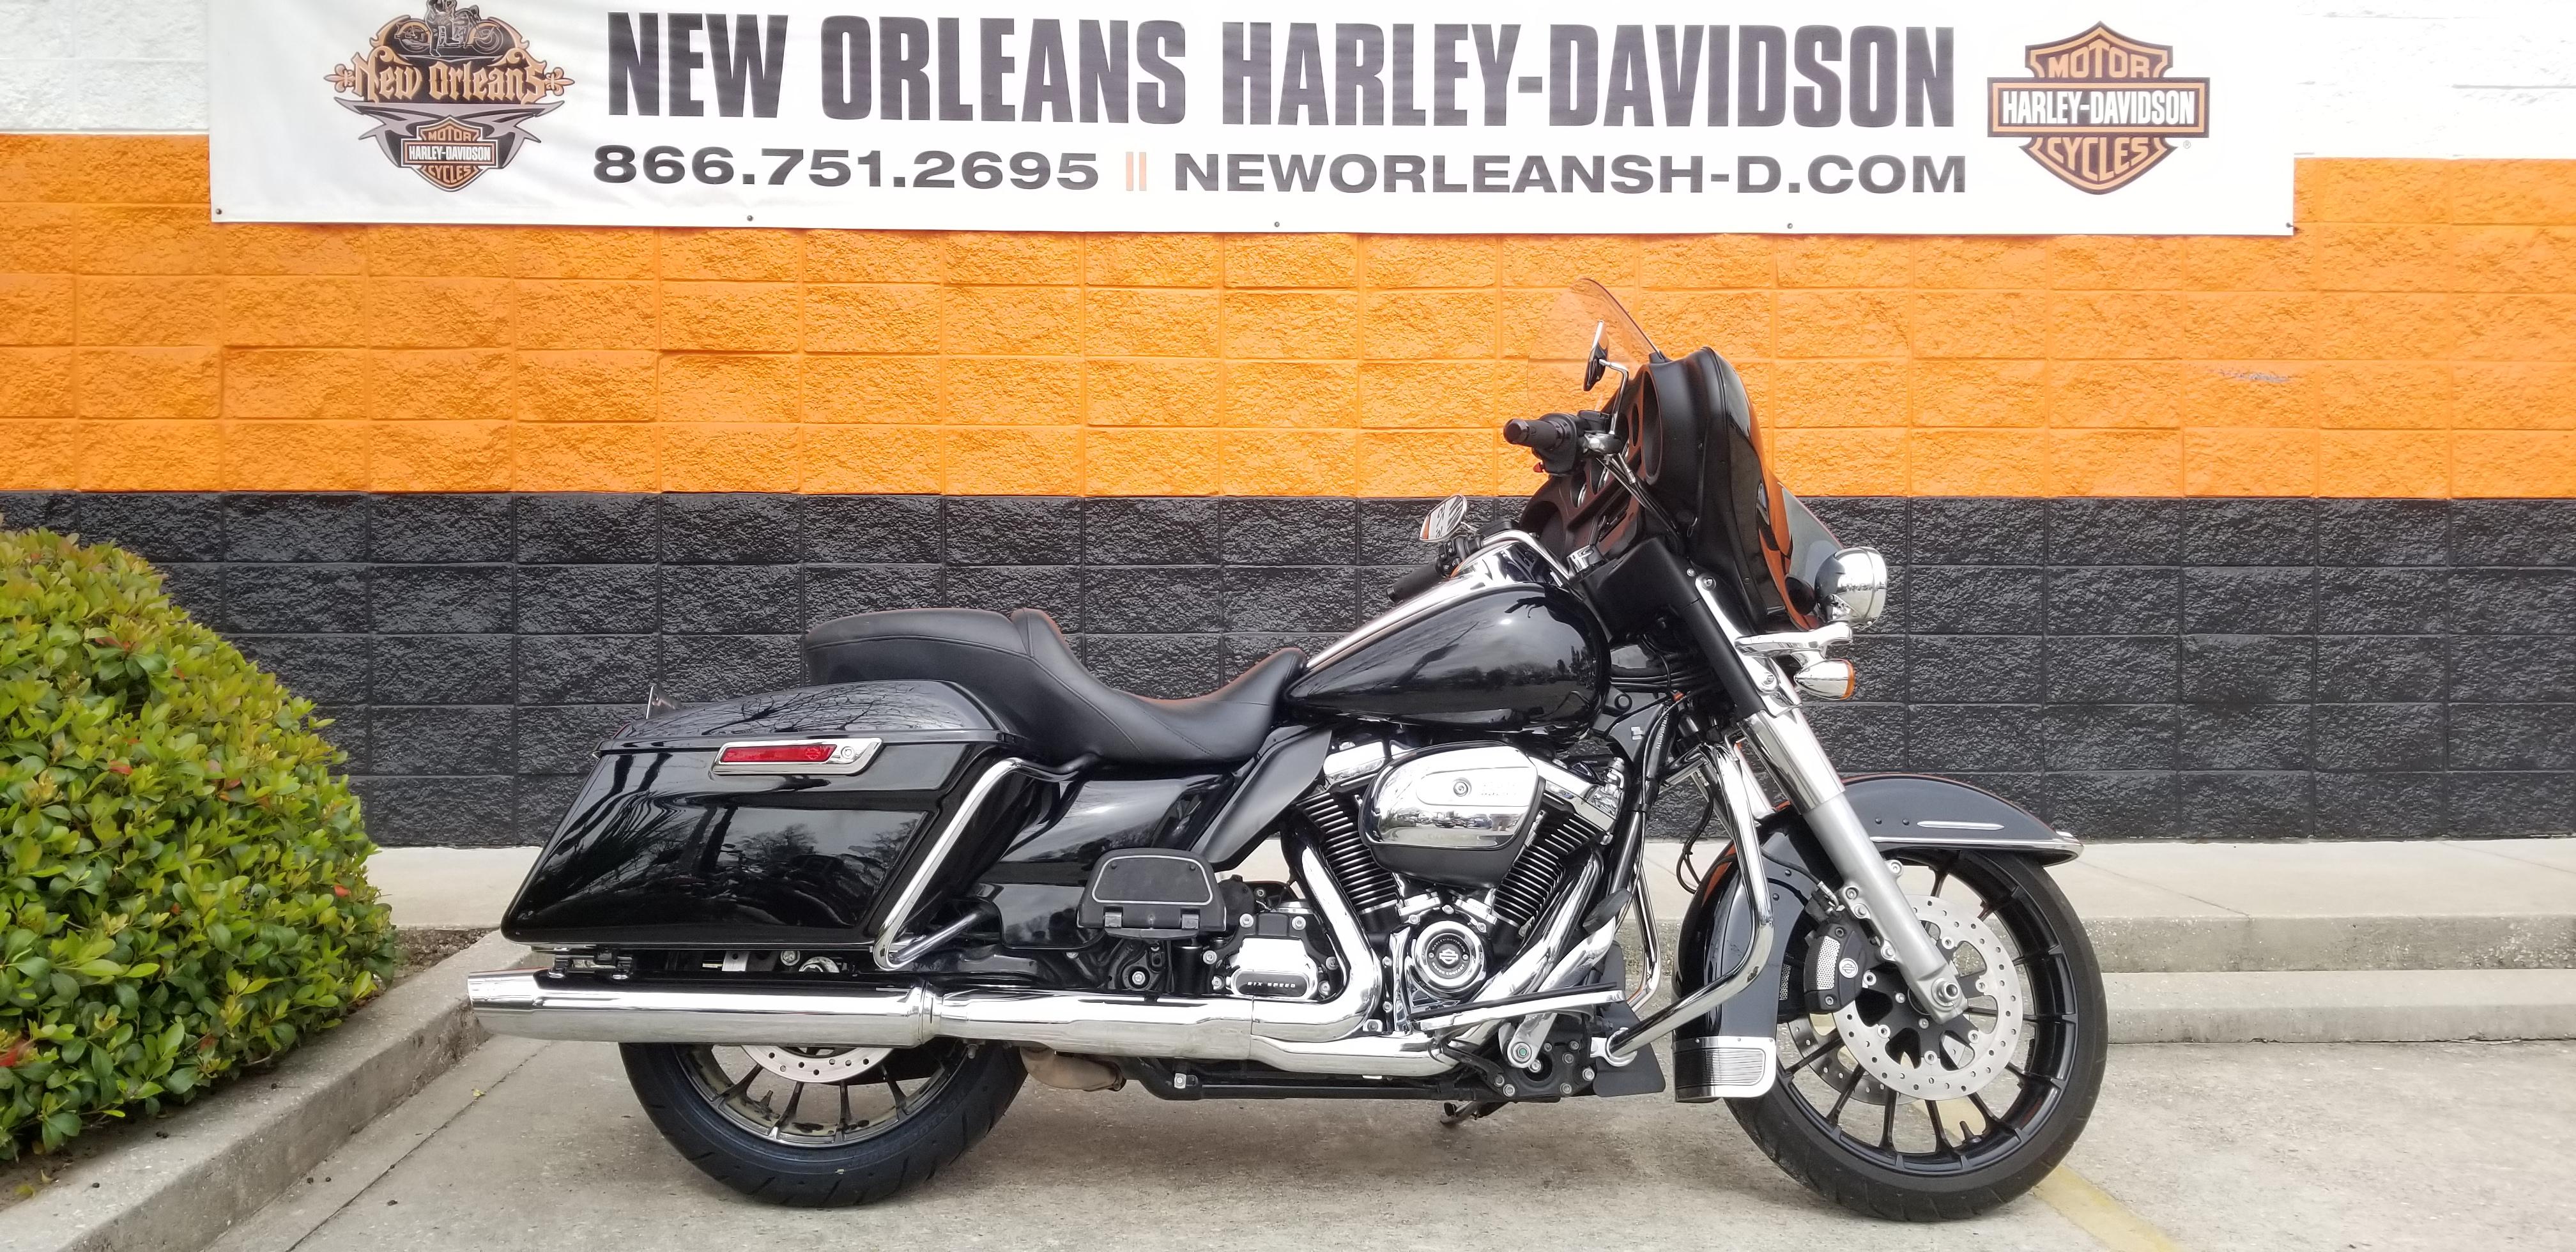 Pre-Owned 2017 Harley-Davidson Electra Glide Police